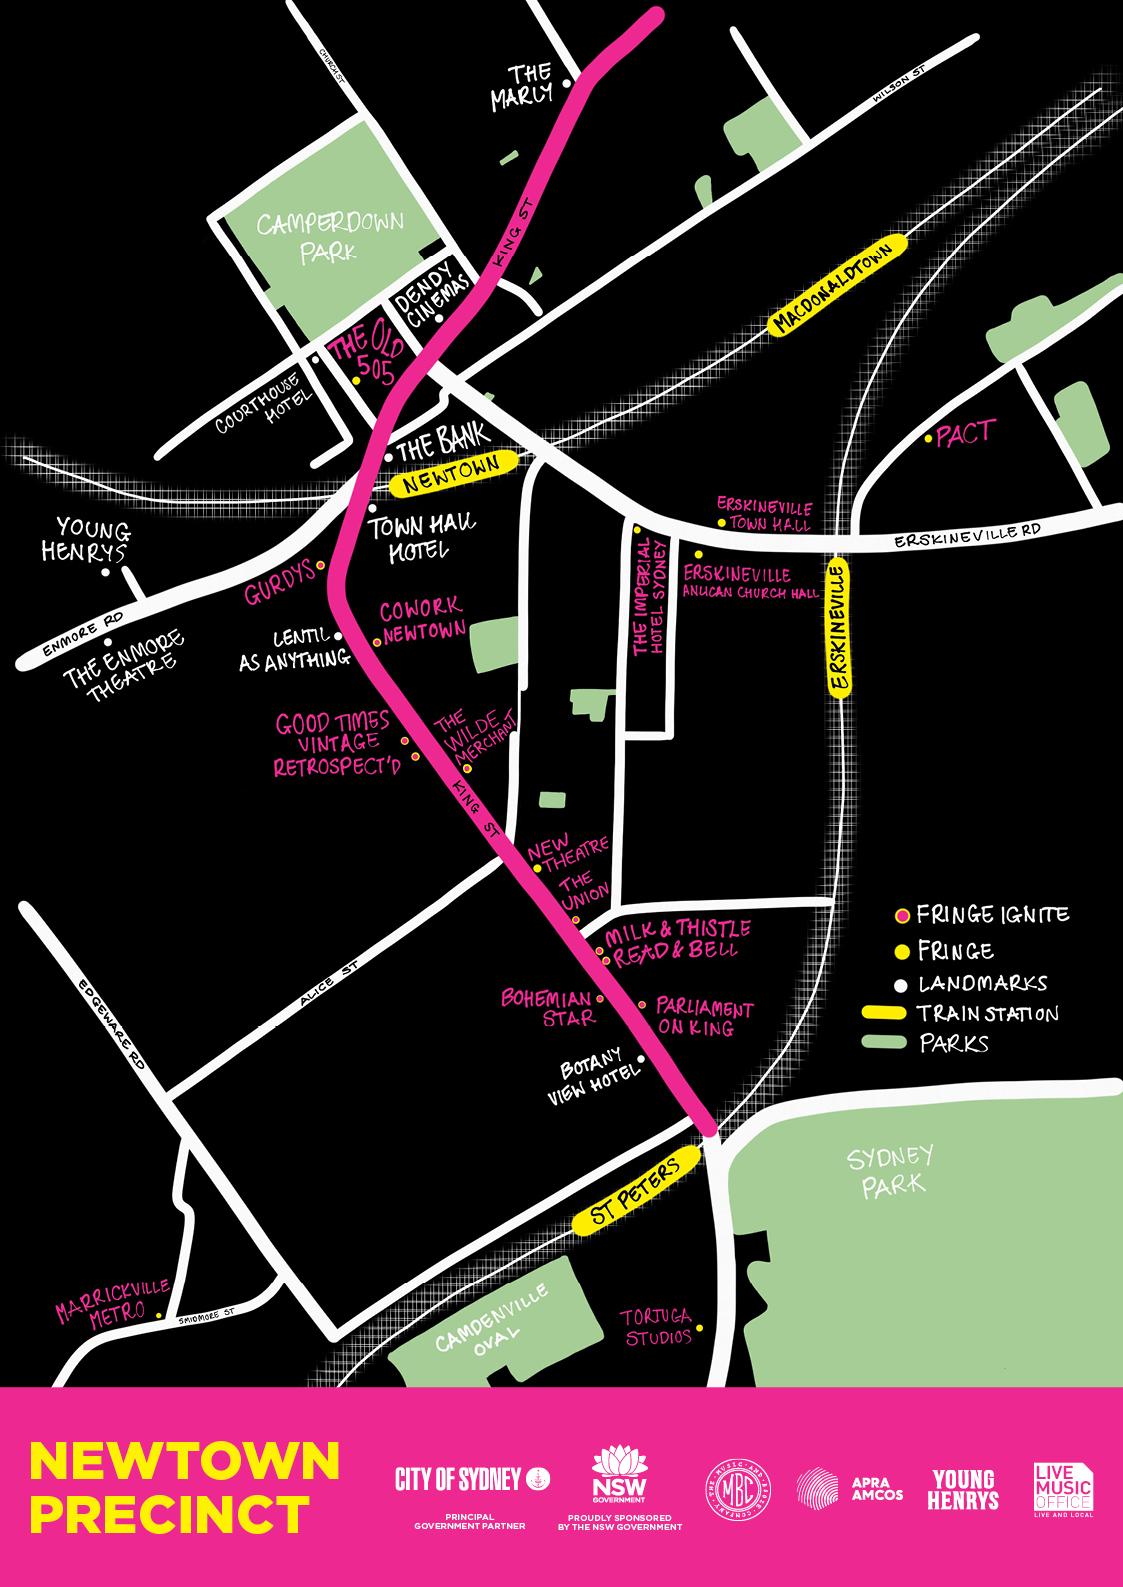 Newtown map_digital_A3.jpg